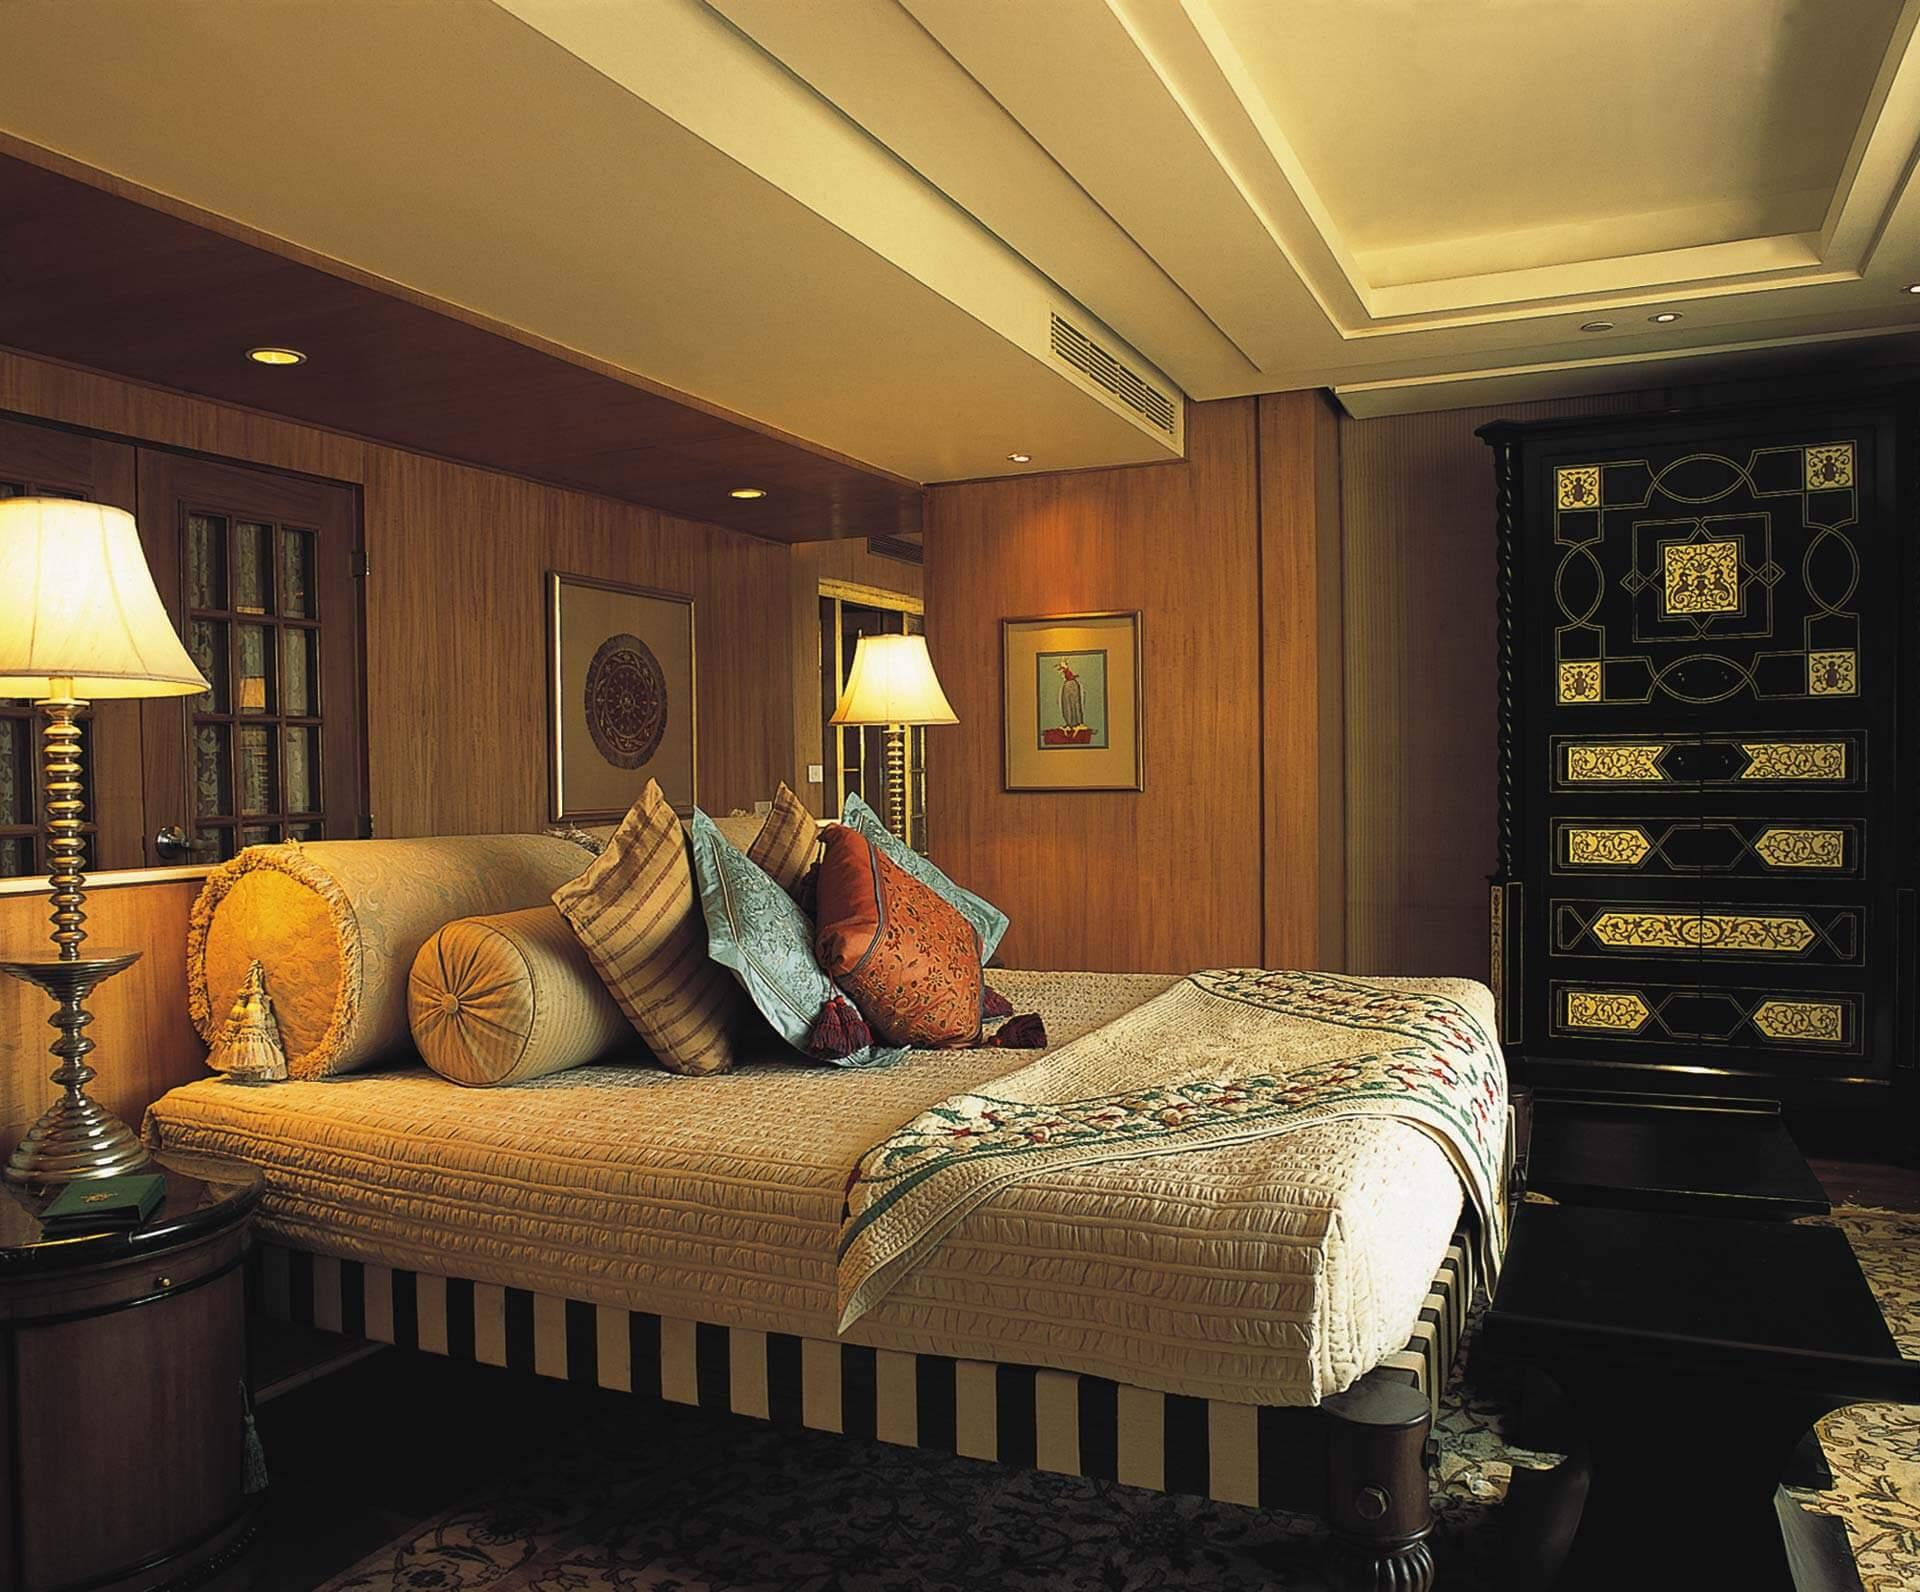 The Oberoi Amarvilas Premier Balcony Room